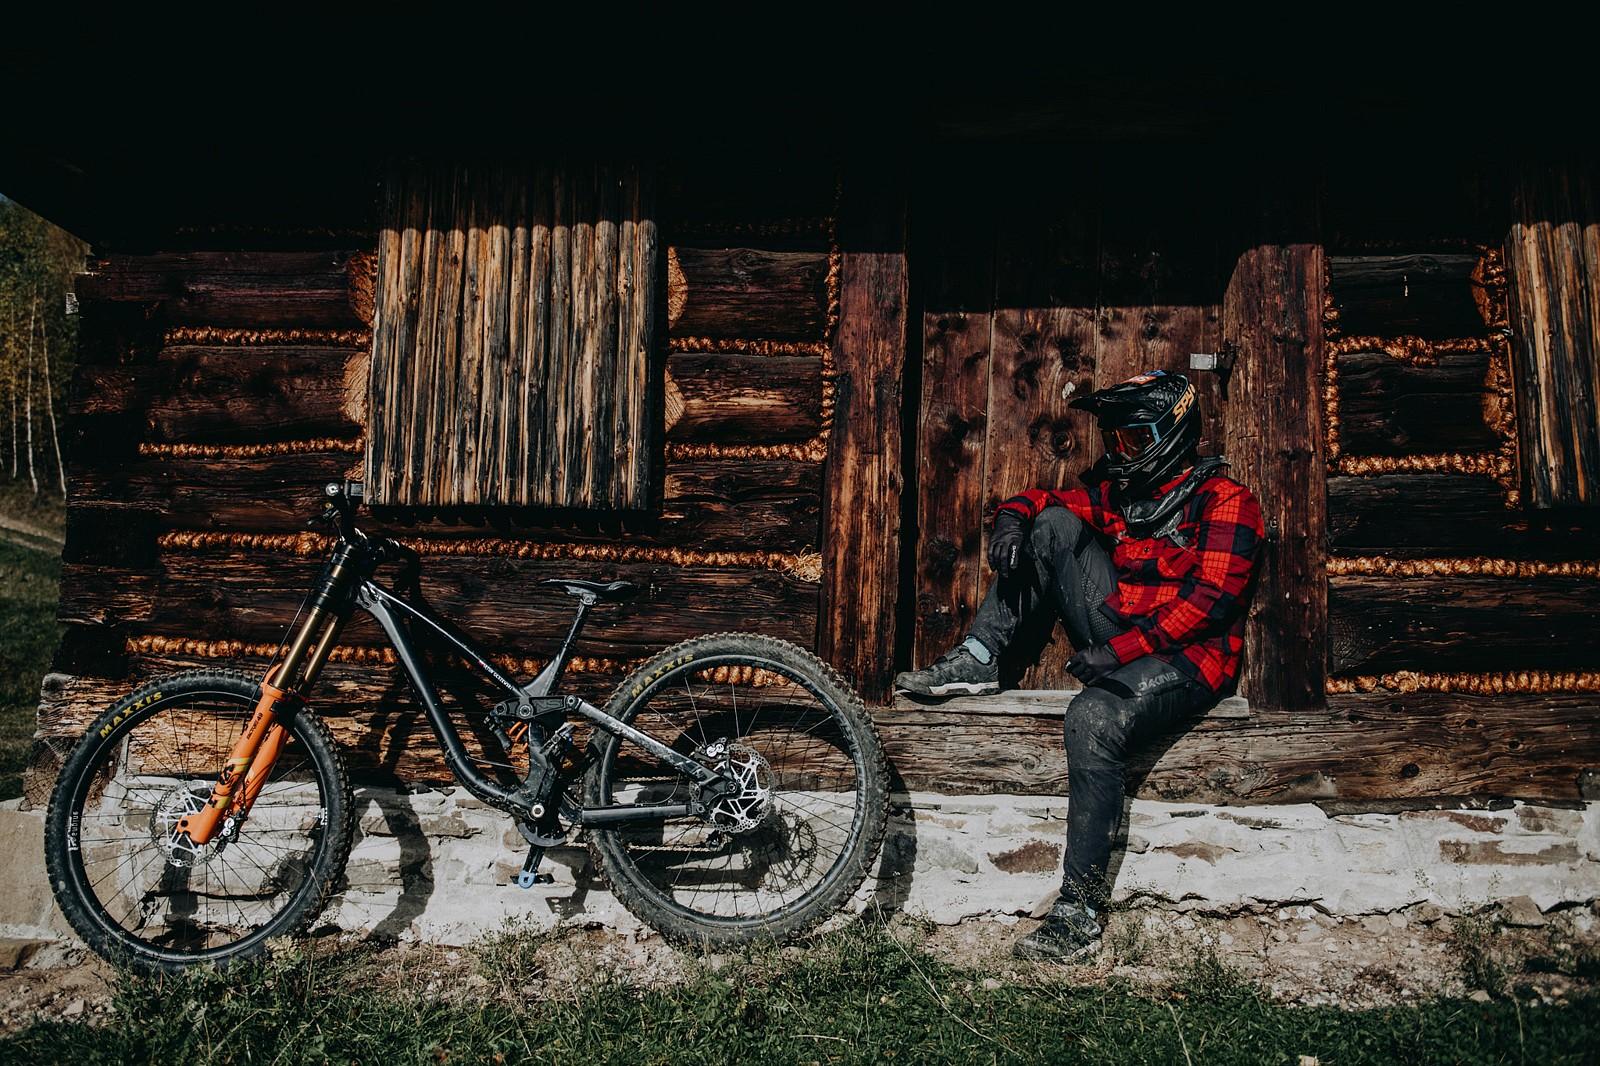 E016E958-C45F-4B97-BCD9-529BF4614E20 - Arczii95 - Mountain Biking Pictures - Vital MTB